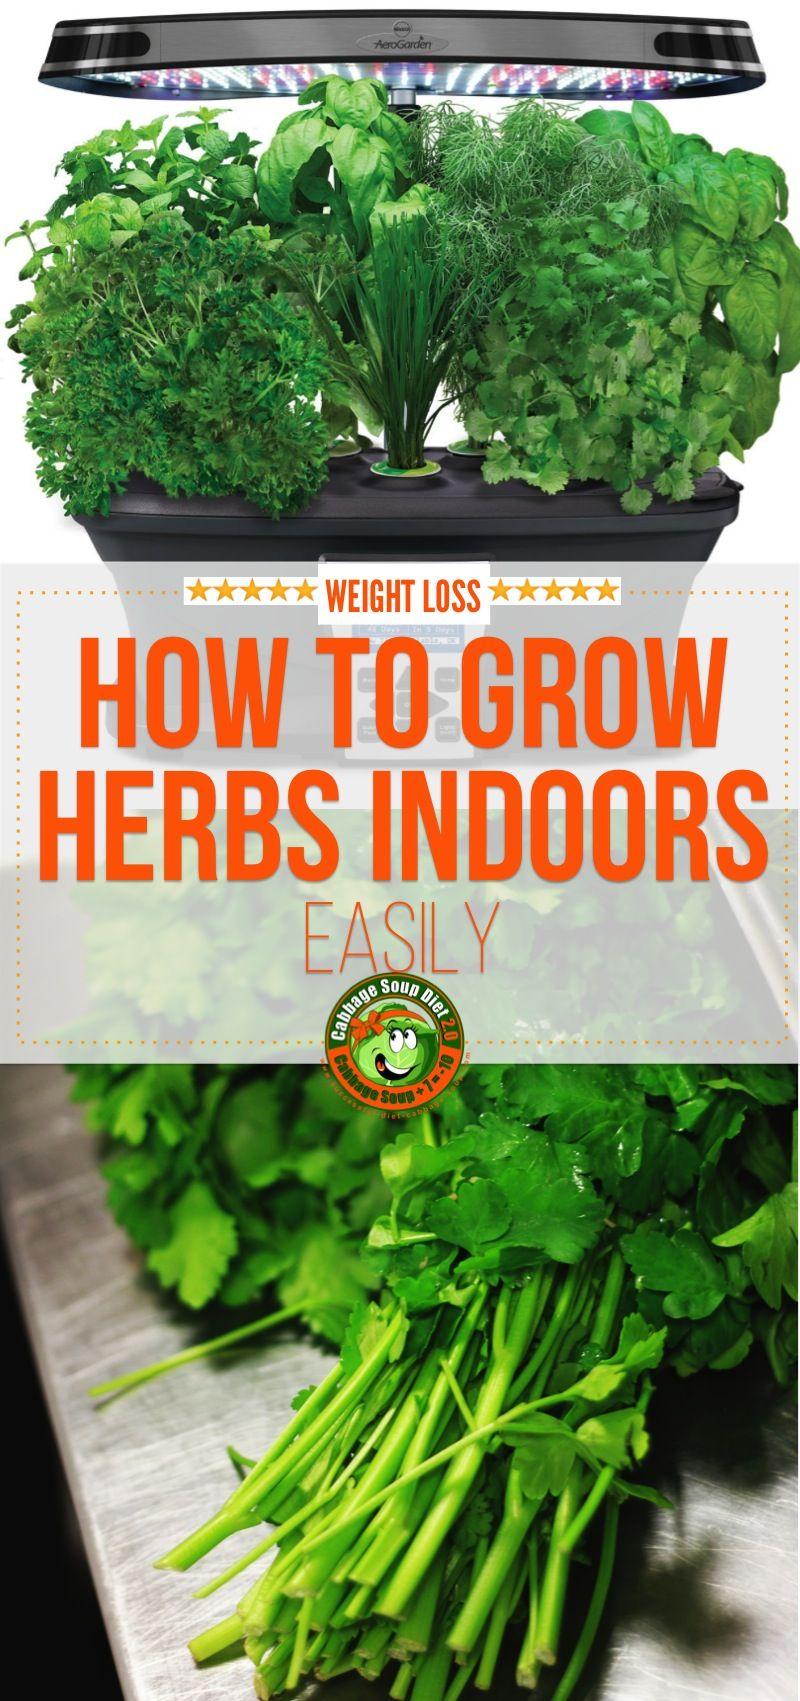 Aerogarden Review How To Grow Herbs Indoors Easily 400 x 300